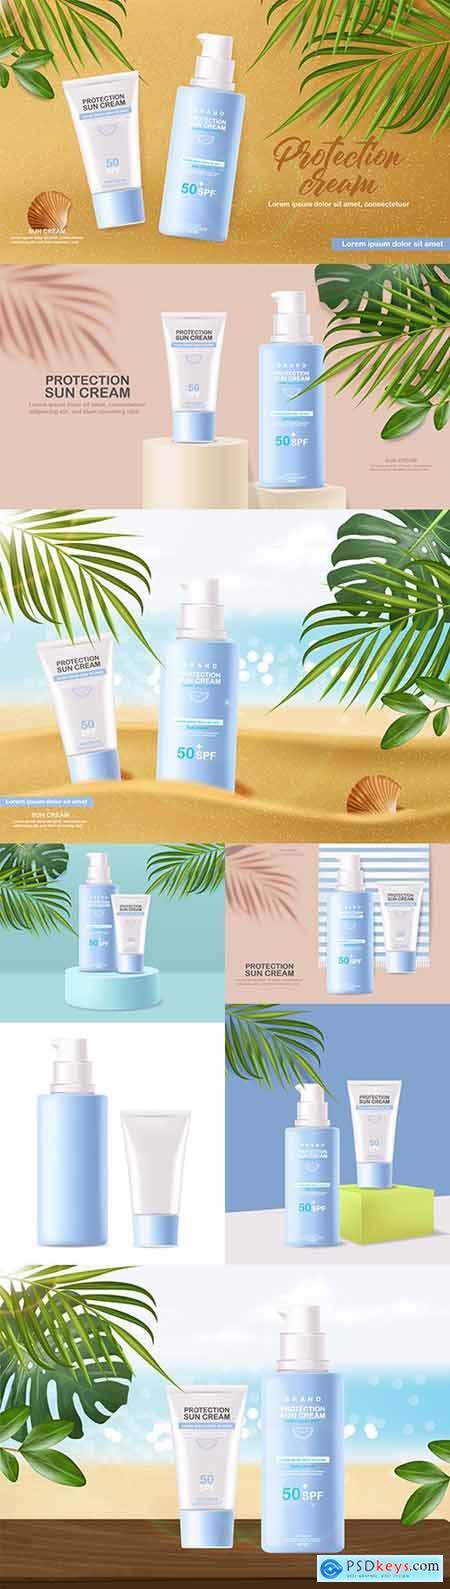 Summer sunscreen cosmetics 3d realistic tropical banner